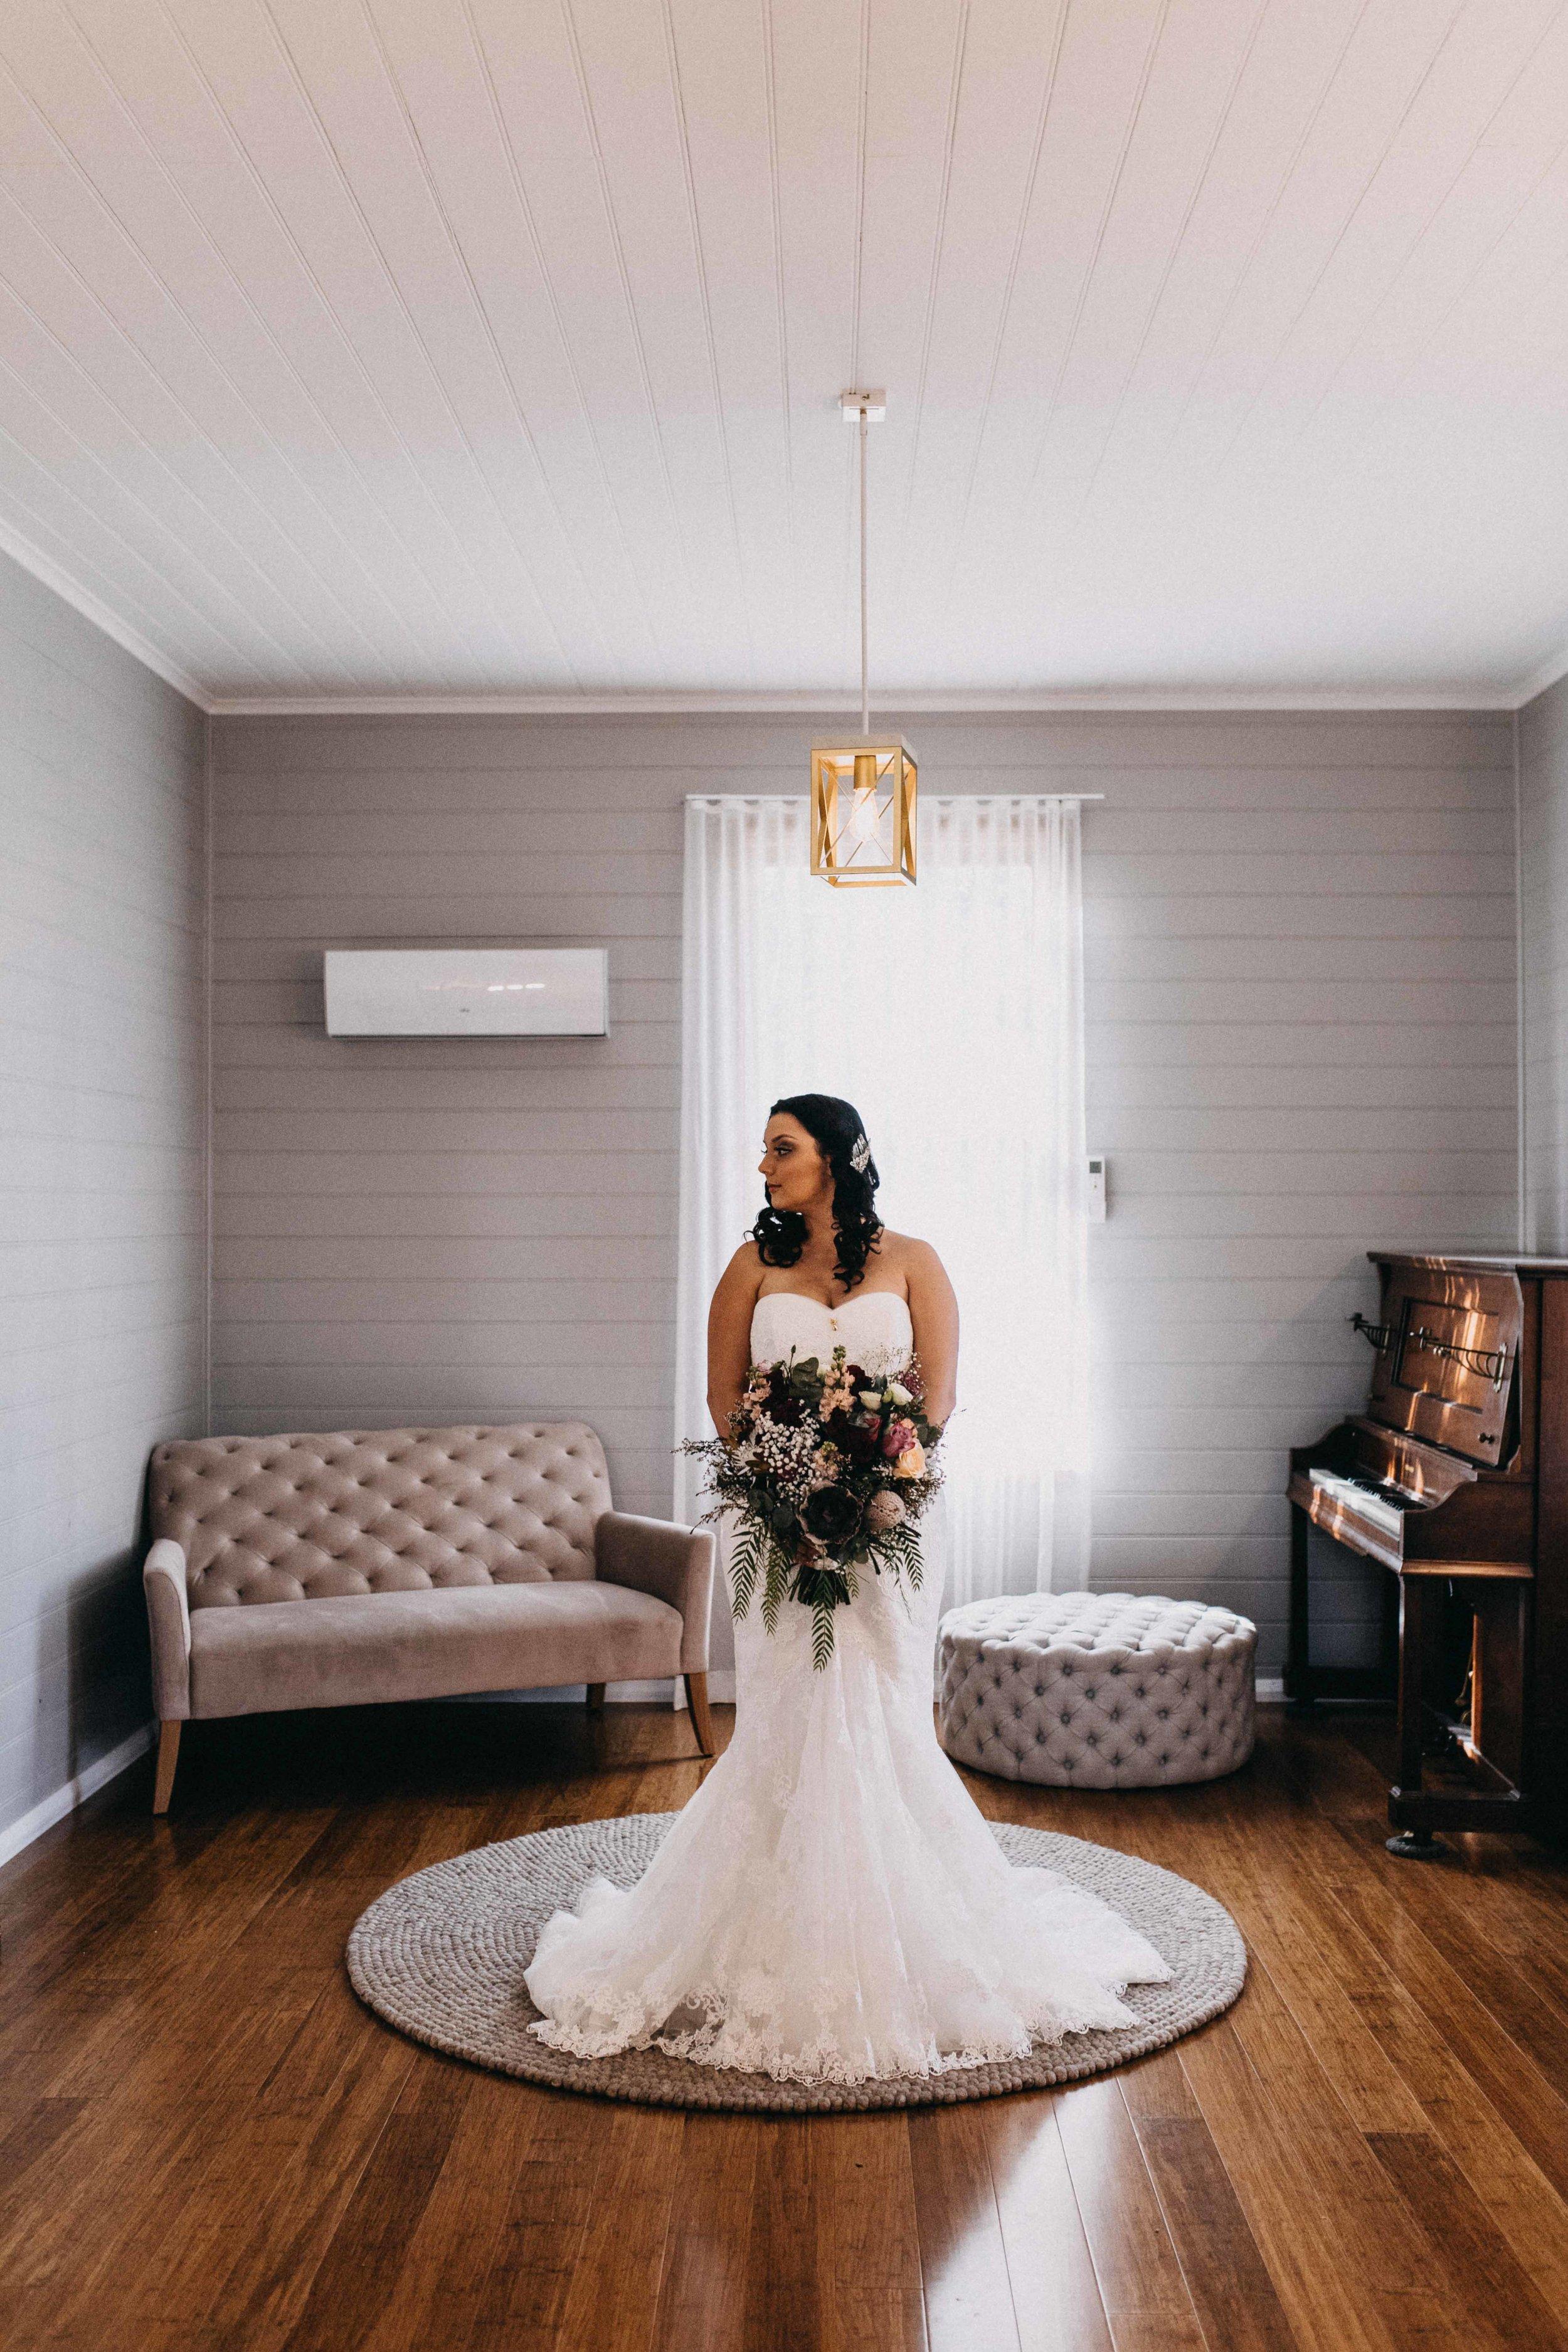 burnham-grove-camden-wedding-emilyobrienphotography-macarthur-44.jpg